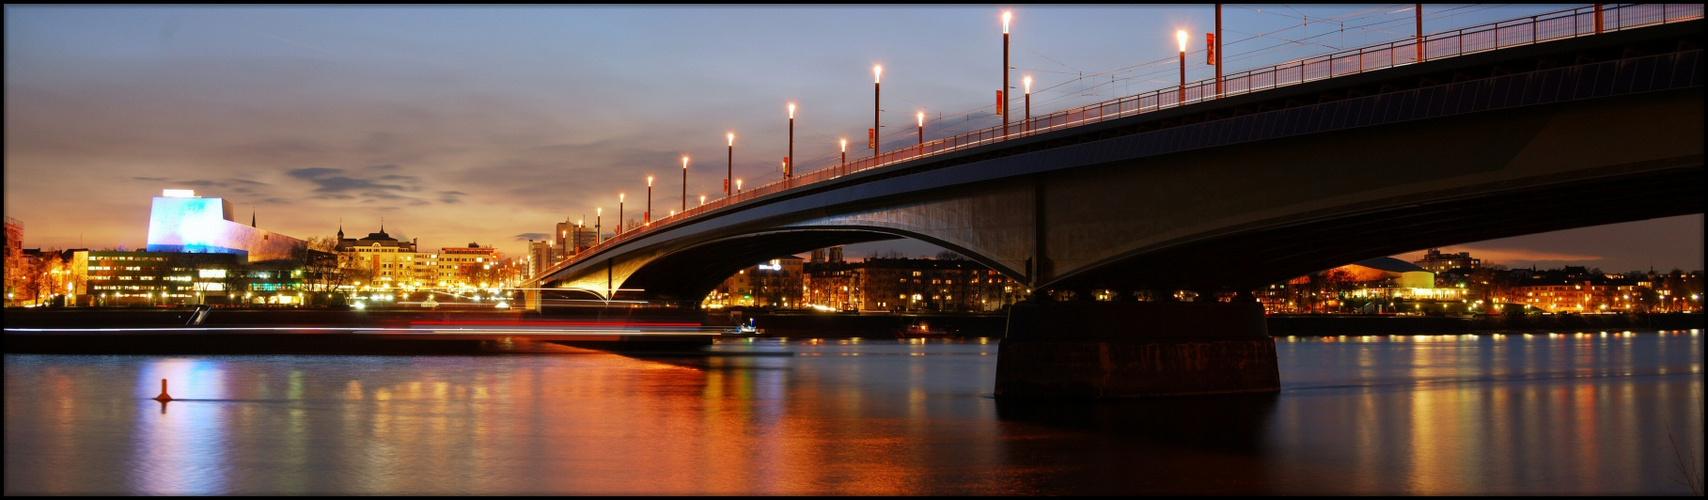 Opernhaus / Kennedy-Brücke II